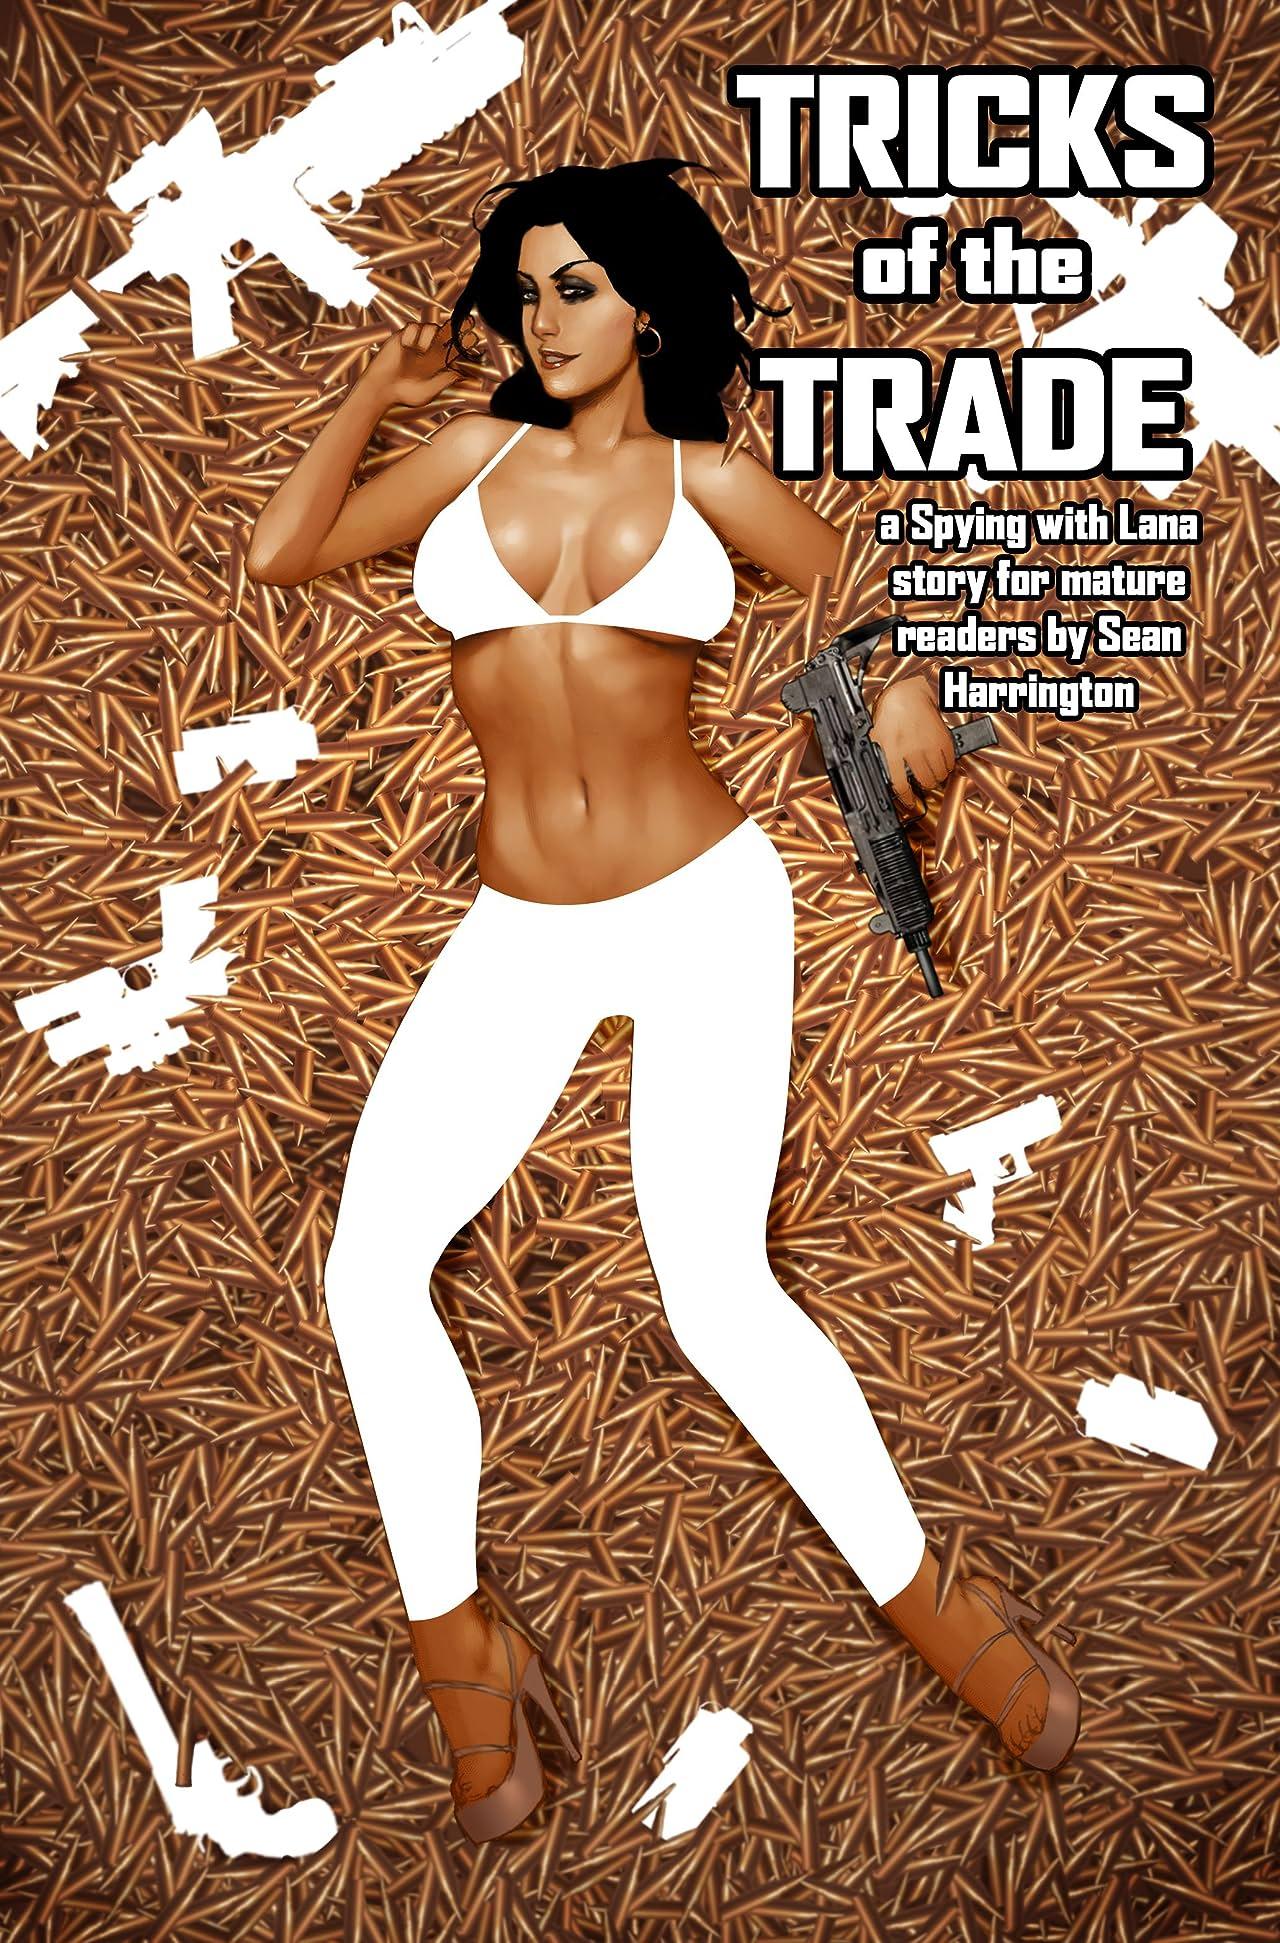 Tricks of the Trade